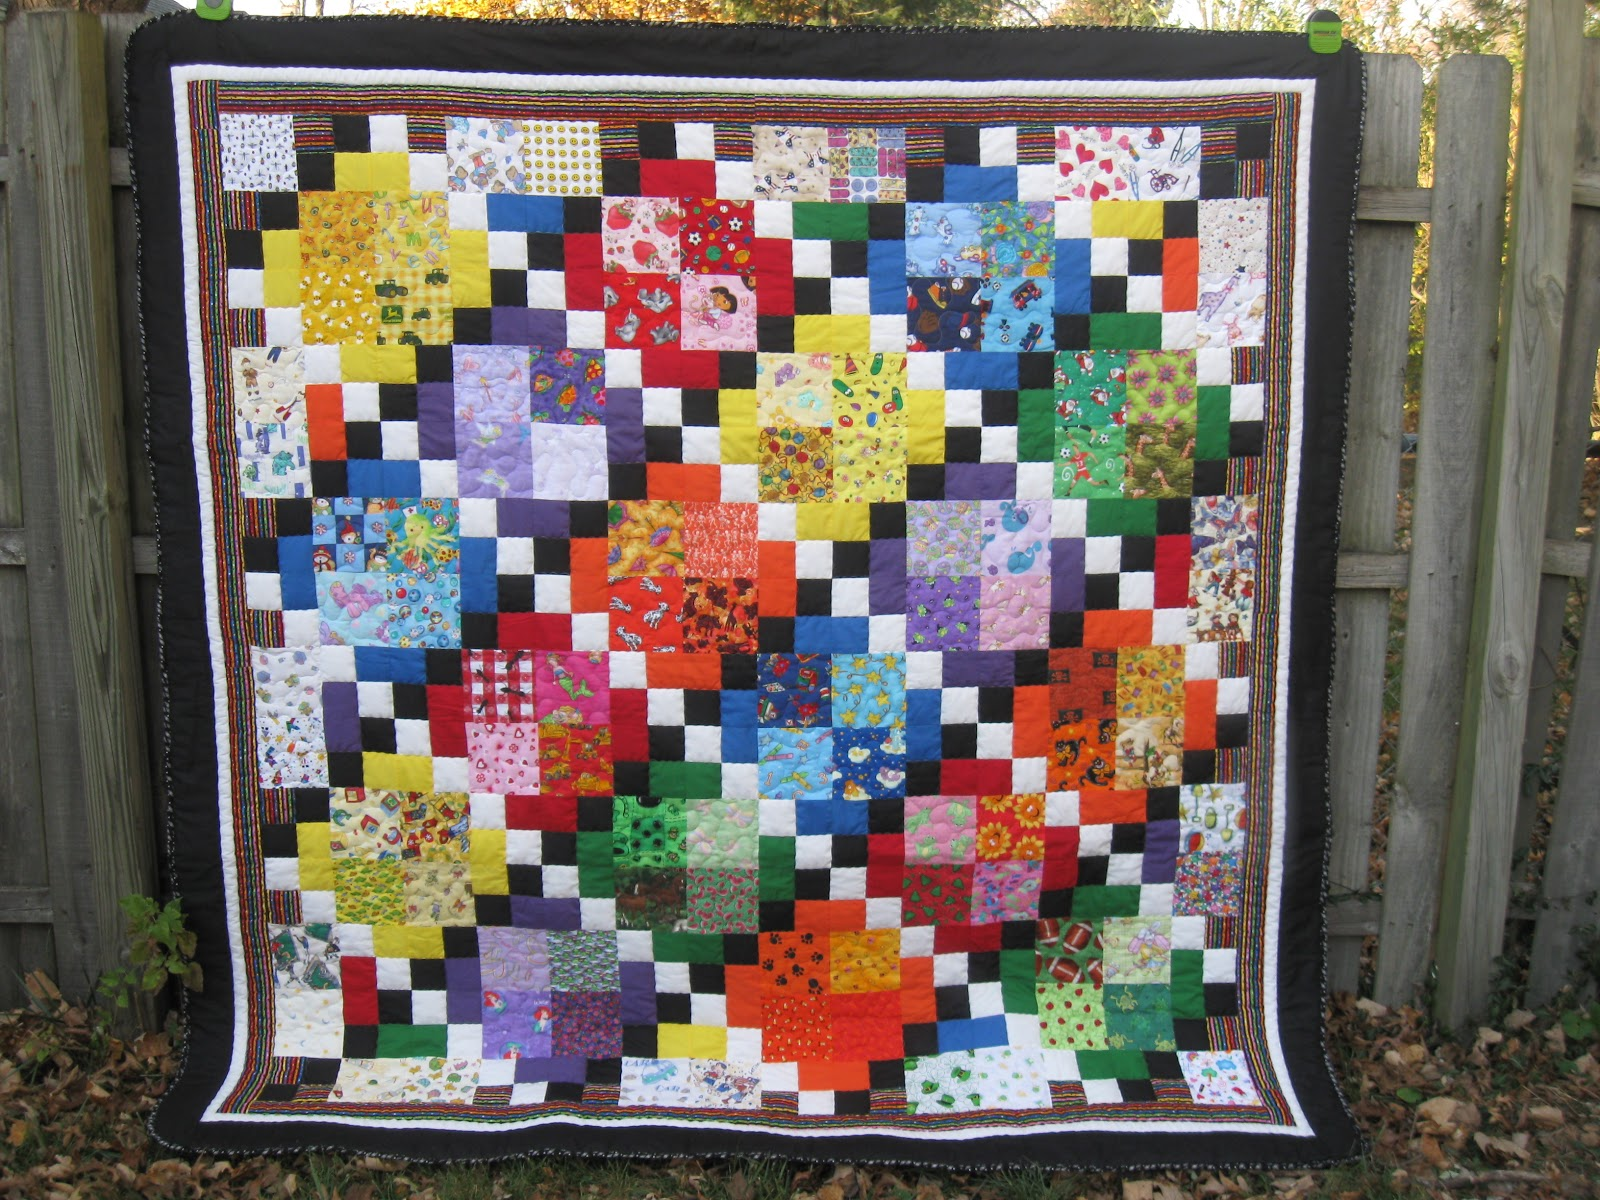 Happy Quilting: I Spy Quilt Tutorial : i spy quilt pattern - Adamdwight.com